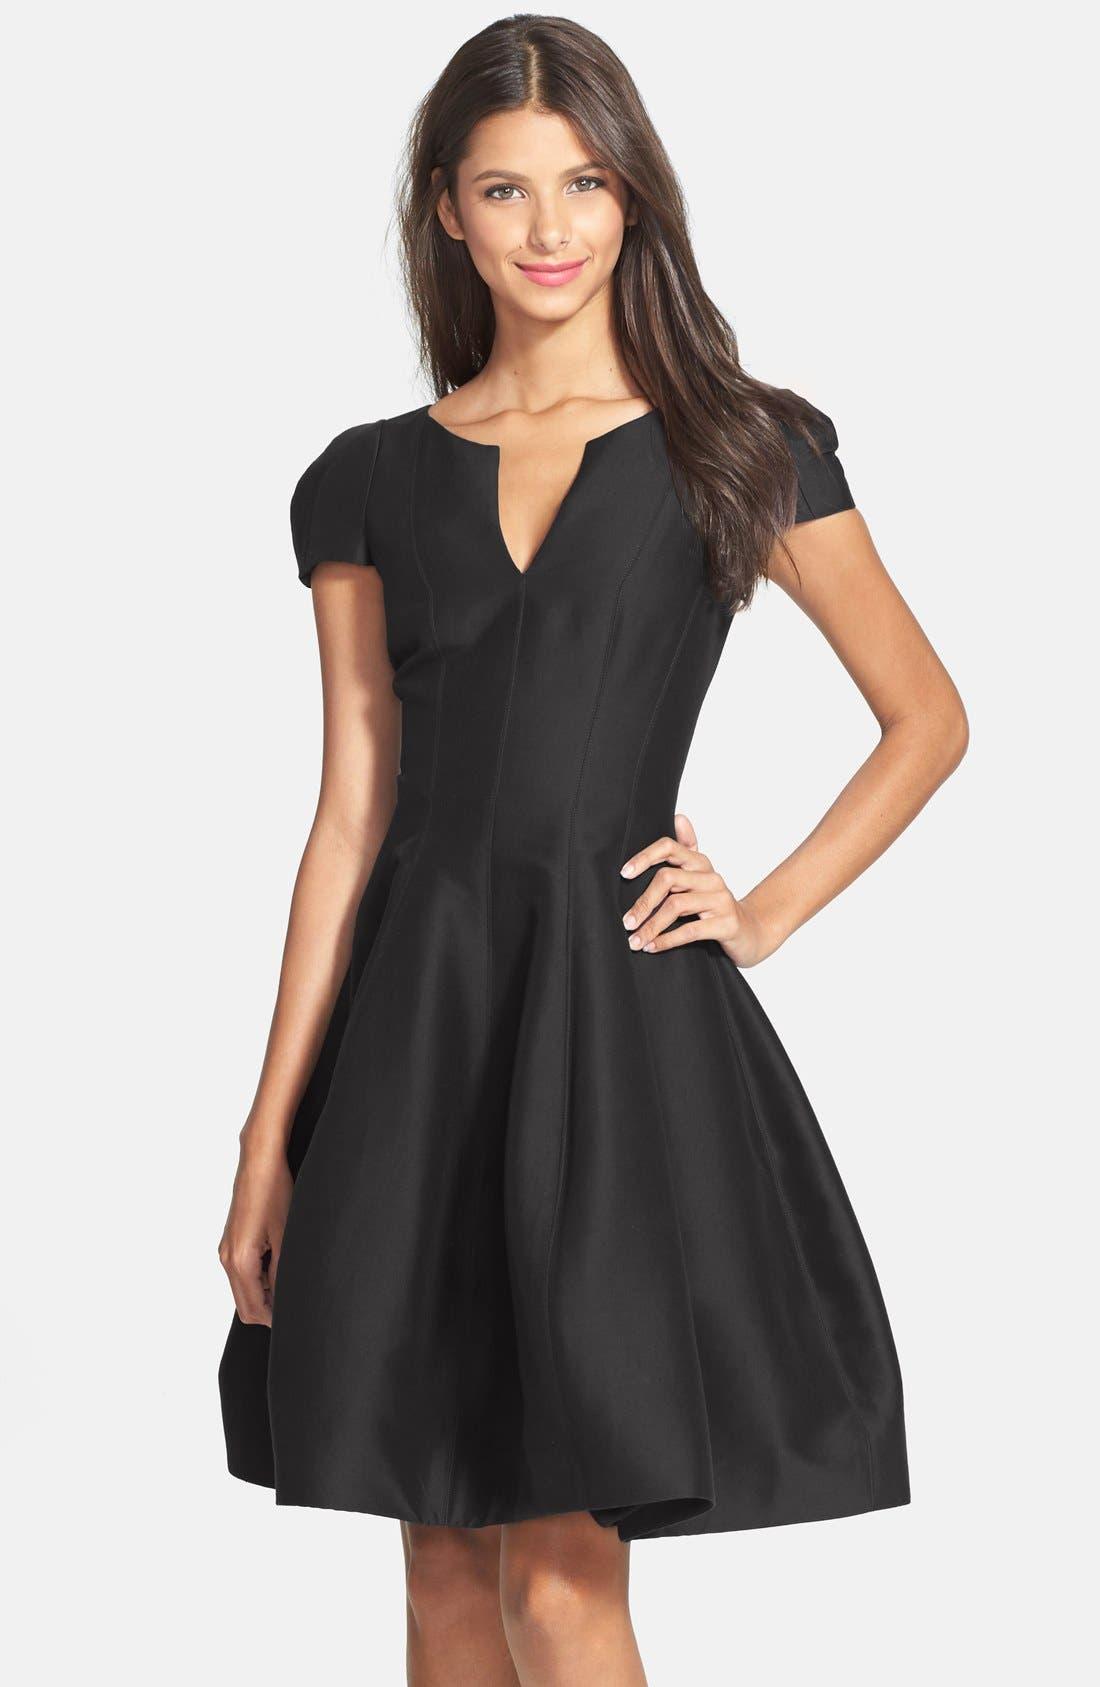 Alternate Image 1 Selected - Halston Heritage Cotton & Silk Fit & Flare Dress